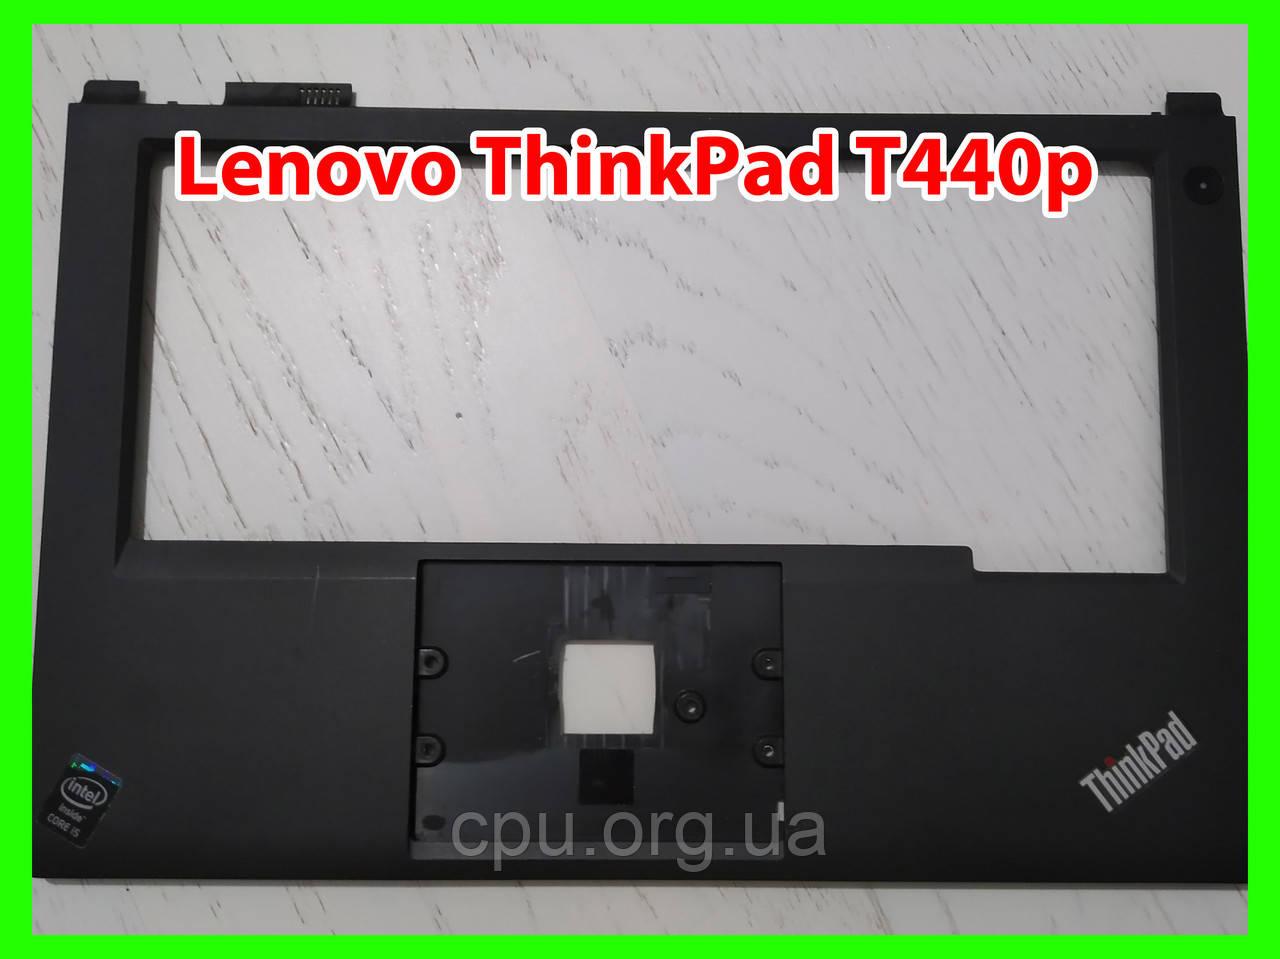 Palmrest Topcase верхняя часть корпуса Lenovo ThinkPad T440p